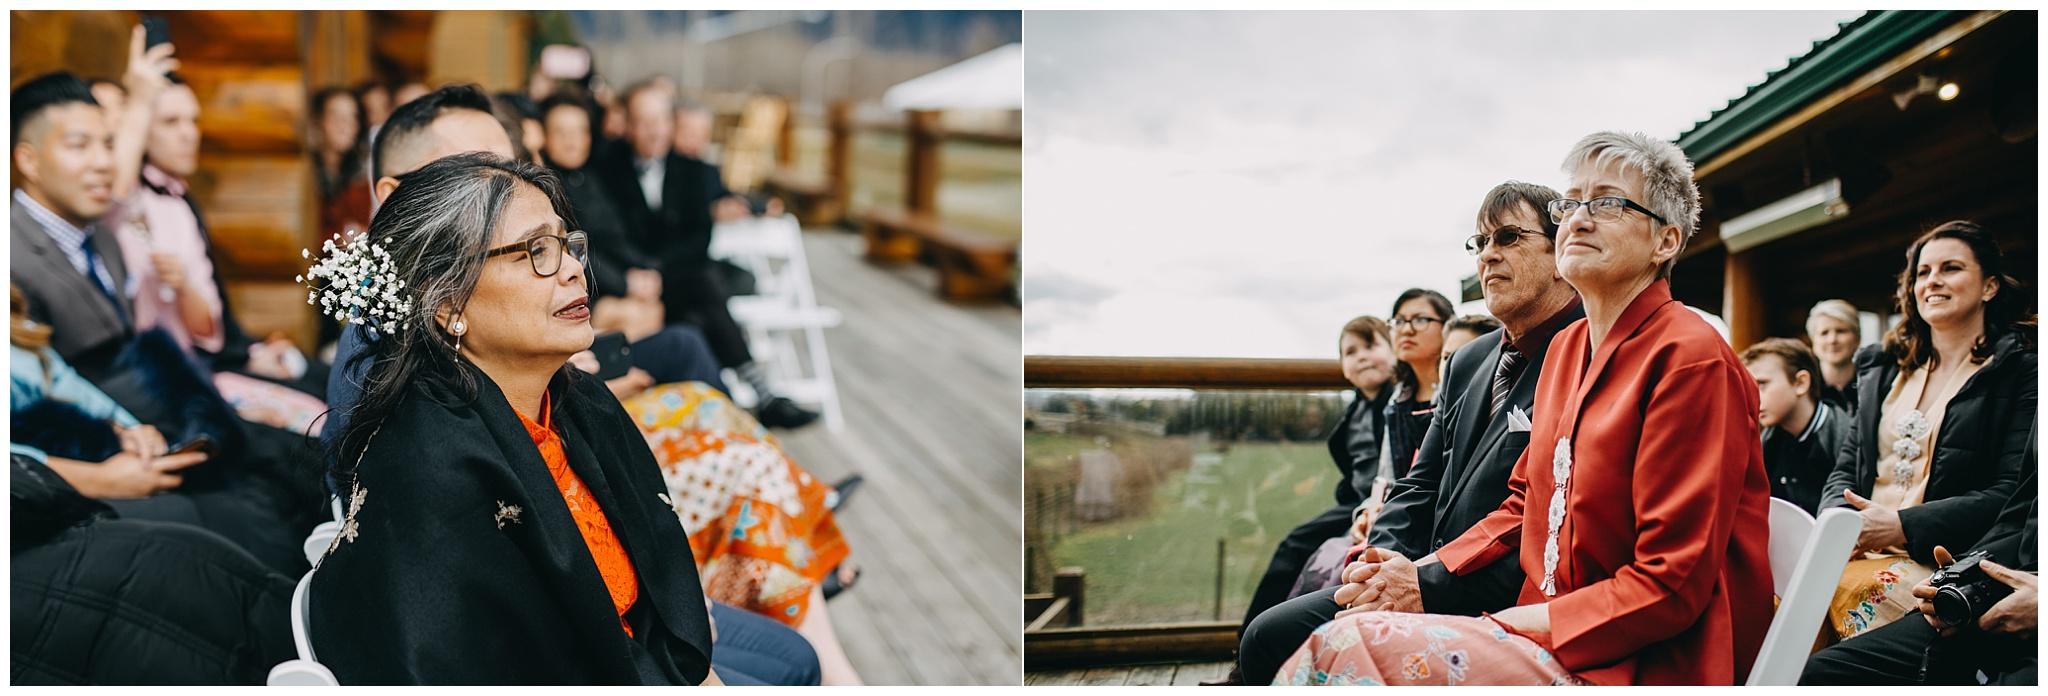 fraser-river-lodge-agassiz-bc-wedding_0050.jpg